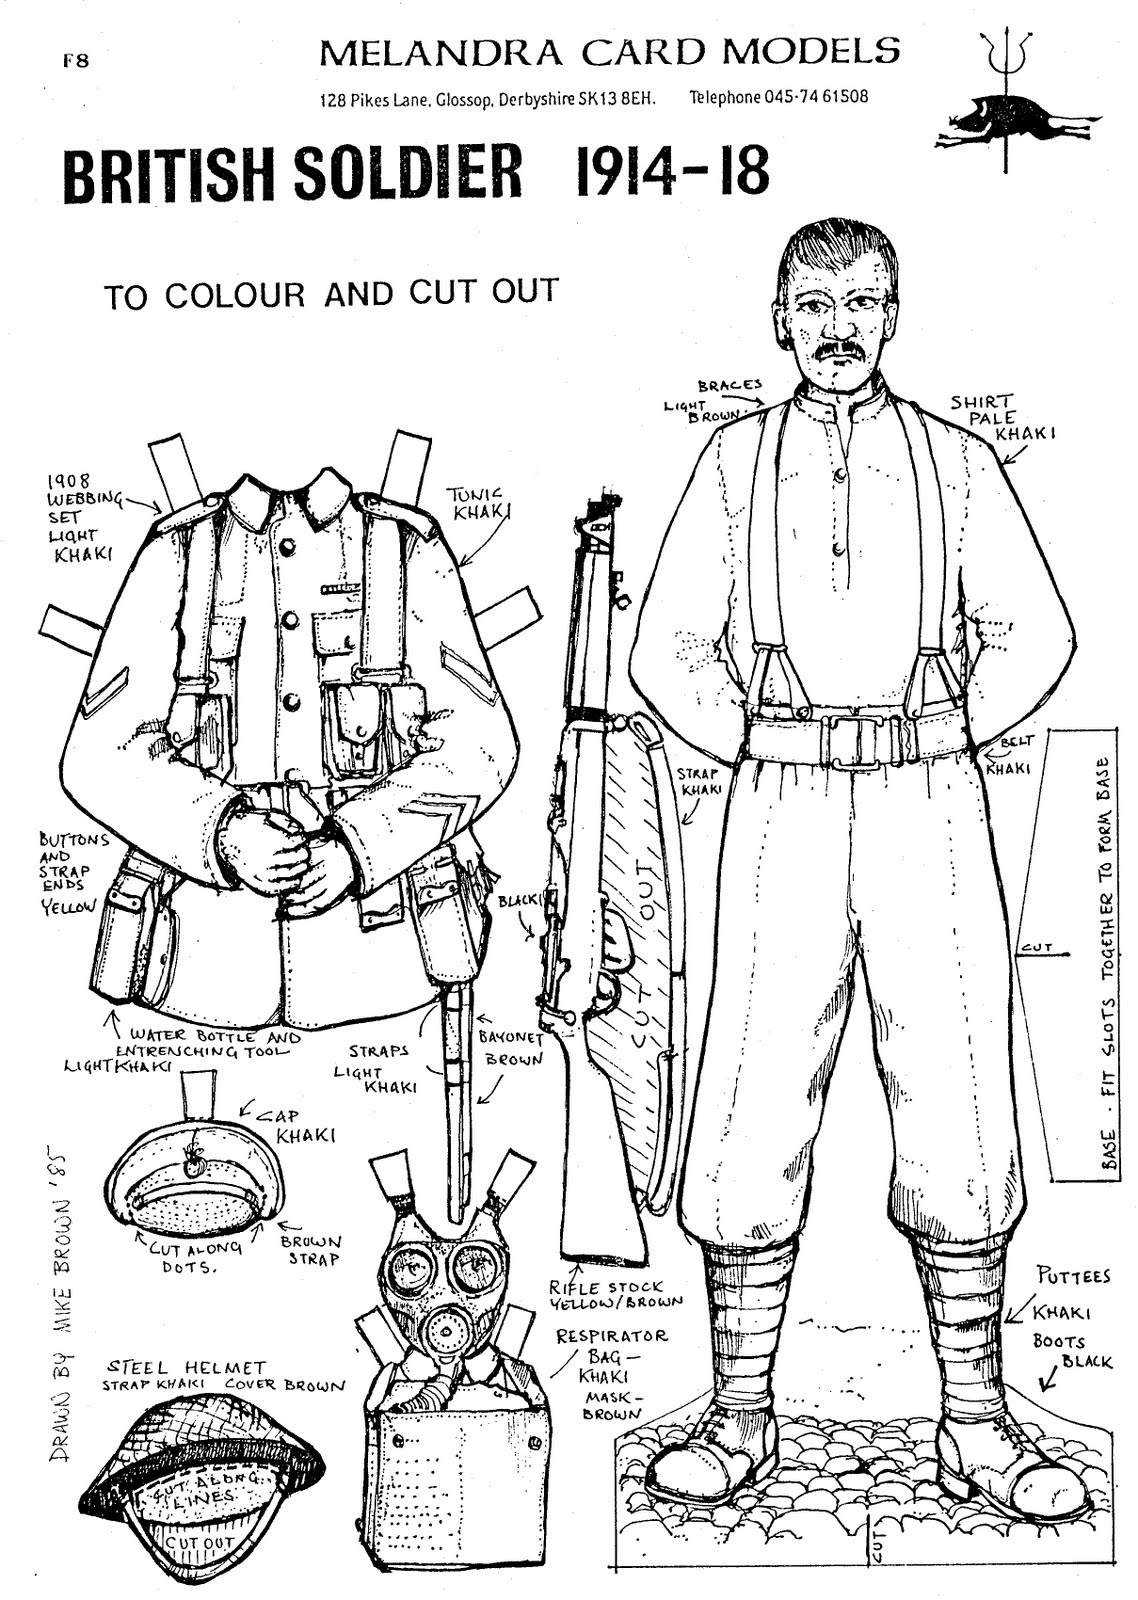 Mostly Paper Dolls: BRITISH SOLDIER 1914-18 from Melandra